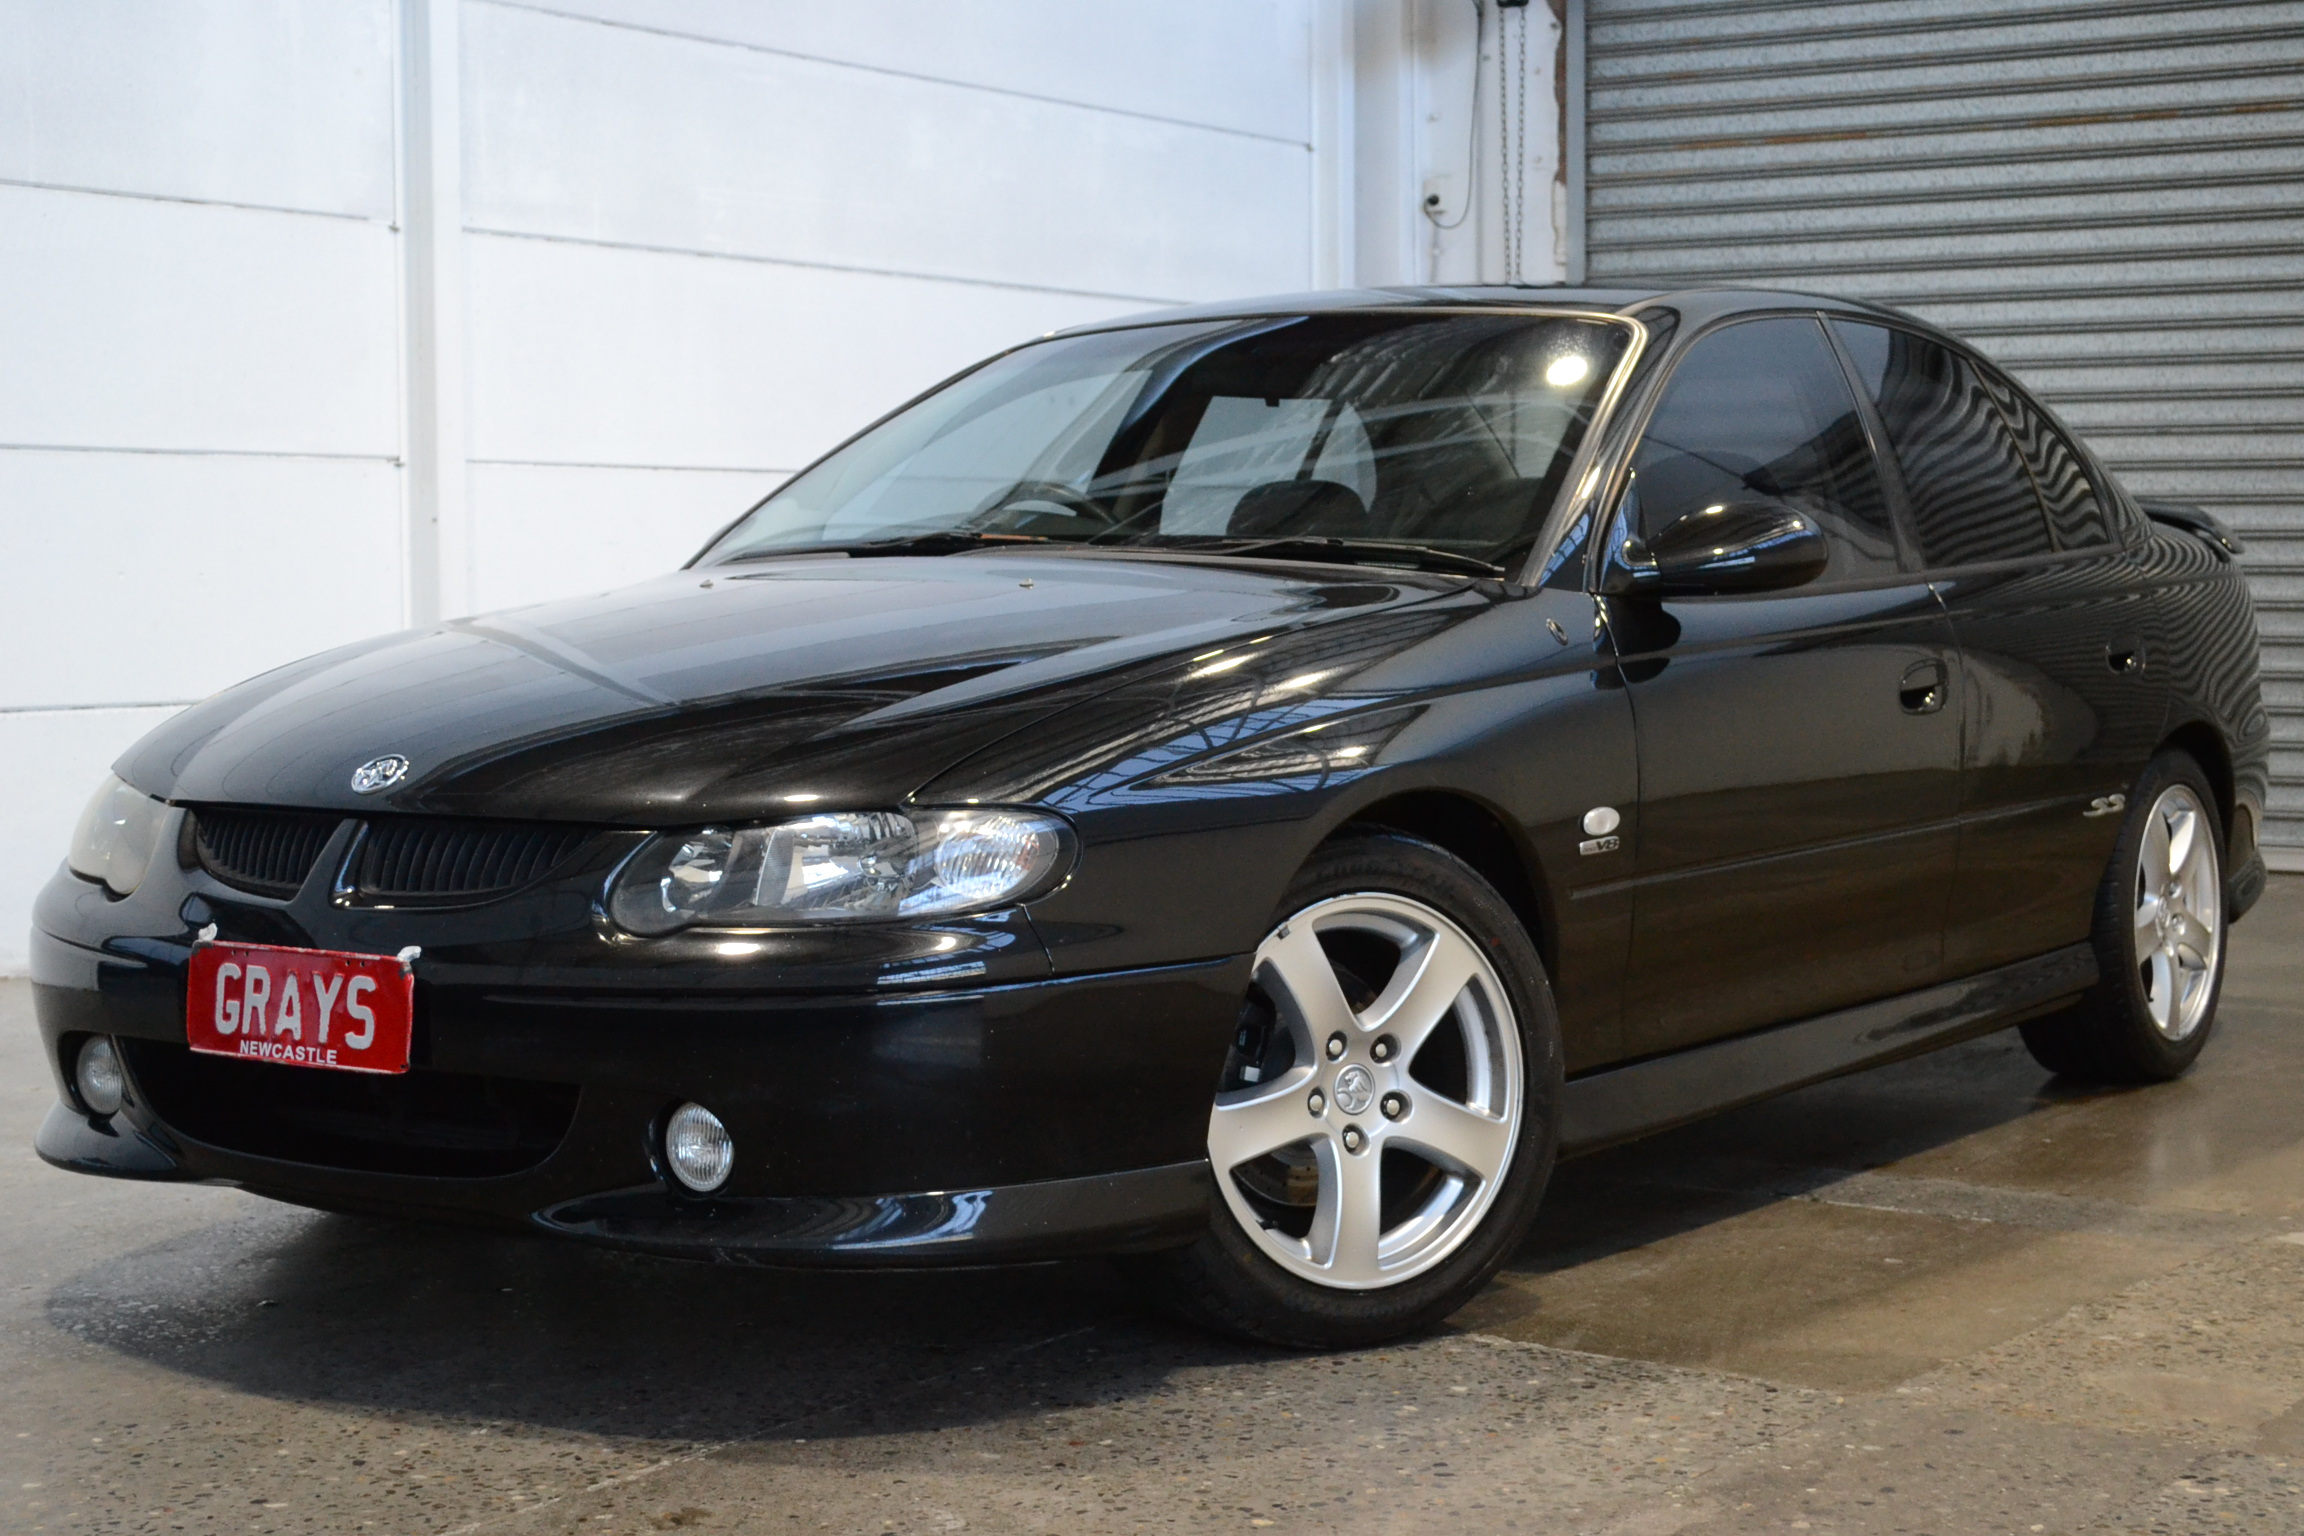 2002 Holden Commodore SS VX Manual Sedan 160077 KMs